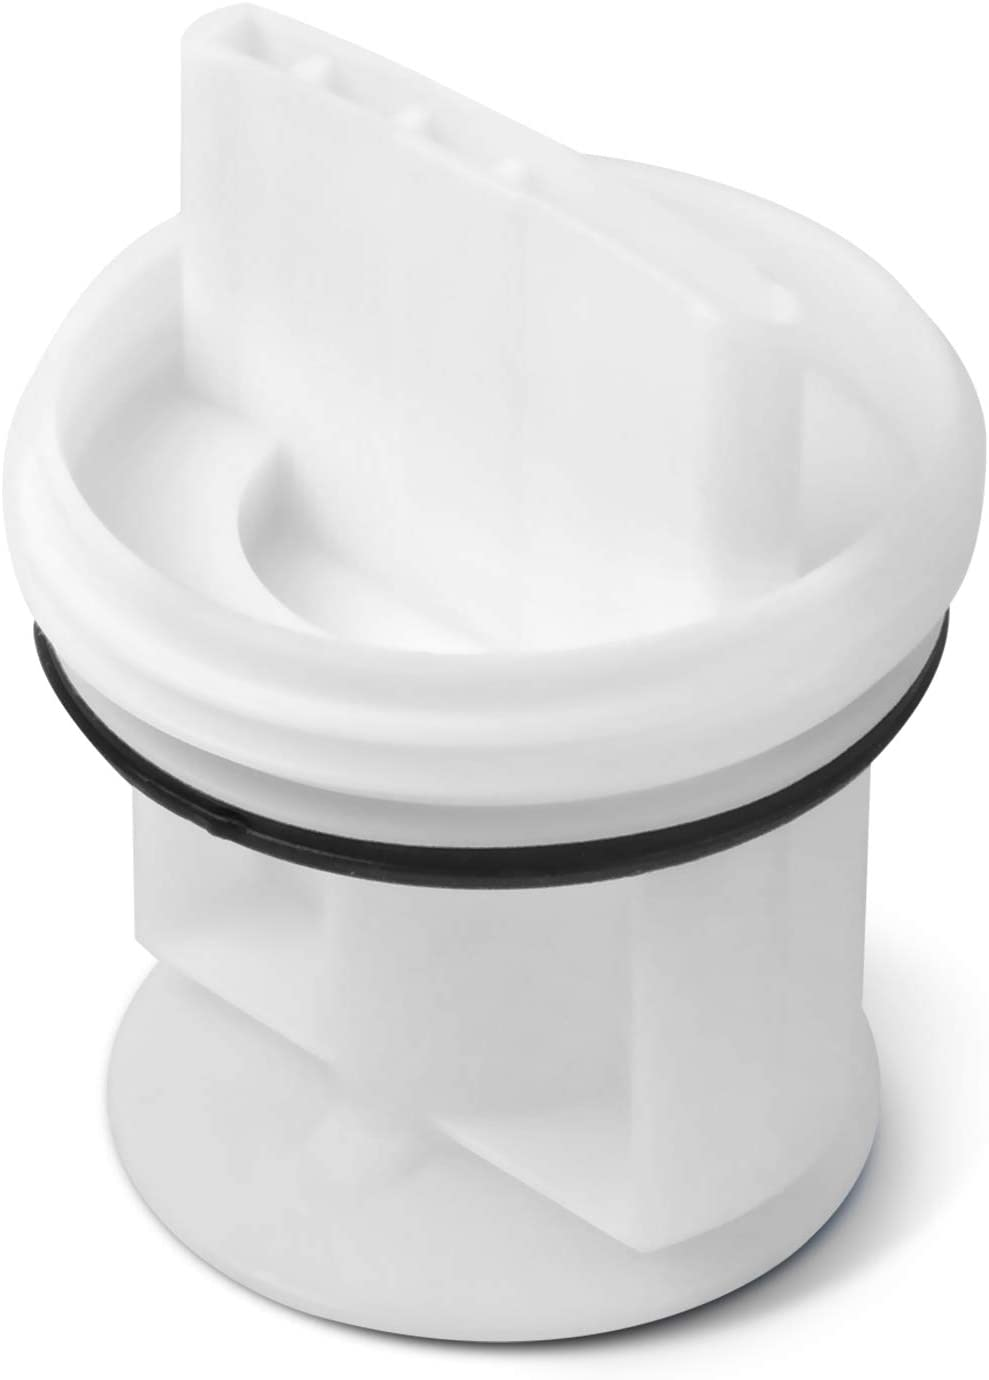 Colador de pelusas para bomba de desagüe de lavadora, Bosch, Siemens, Balay, Zelmer, como 00605010, 605010, 00602008, 602008